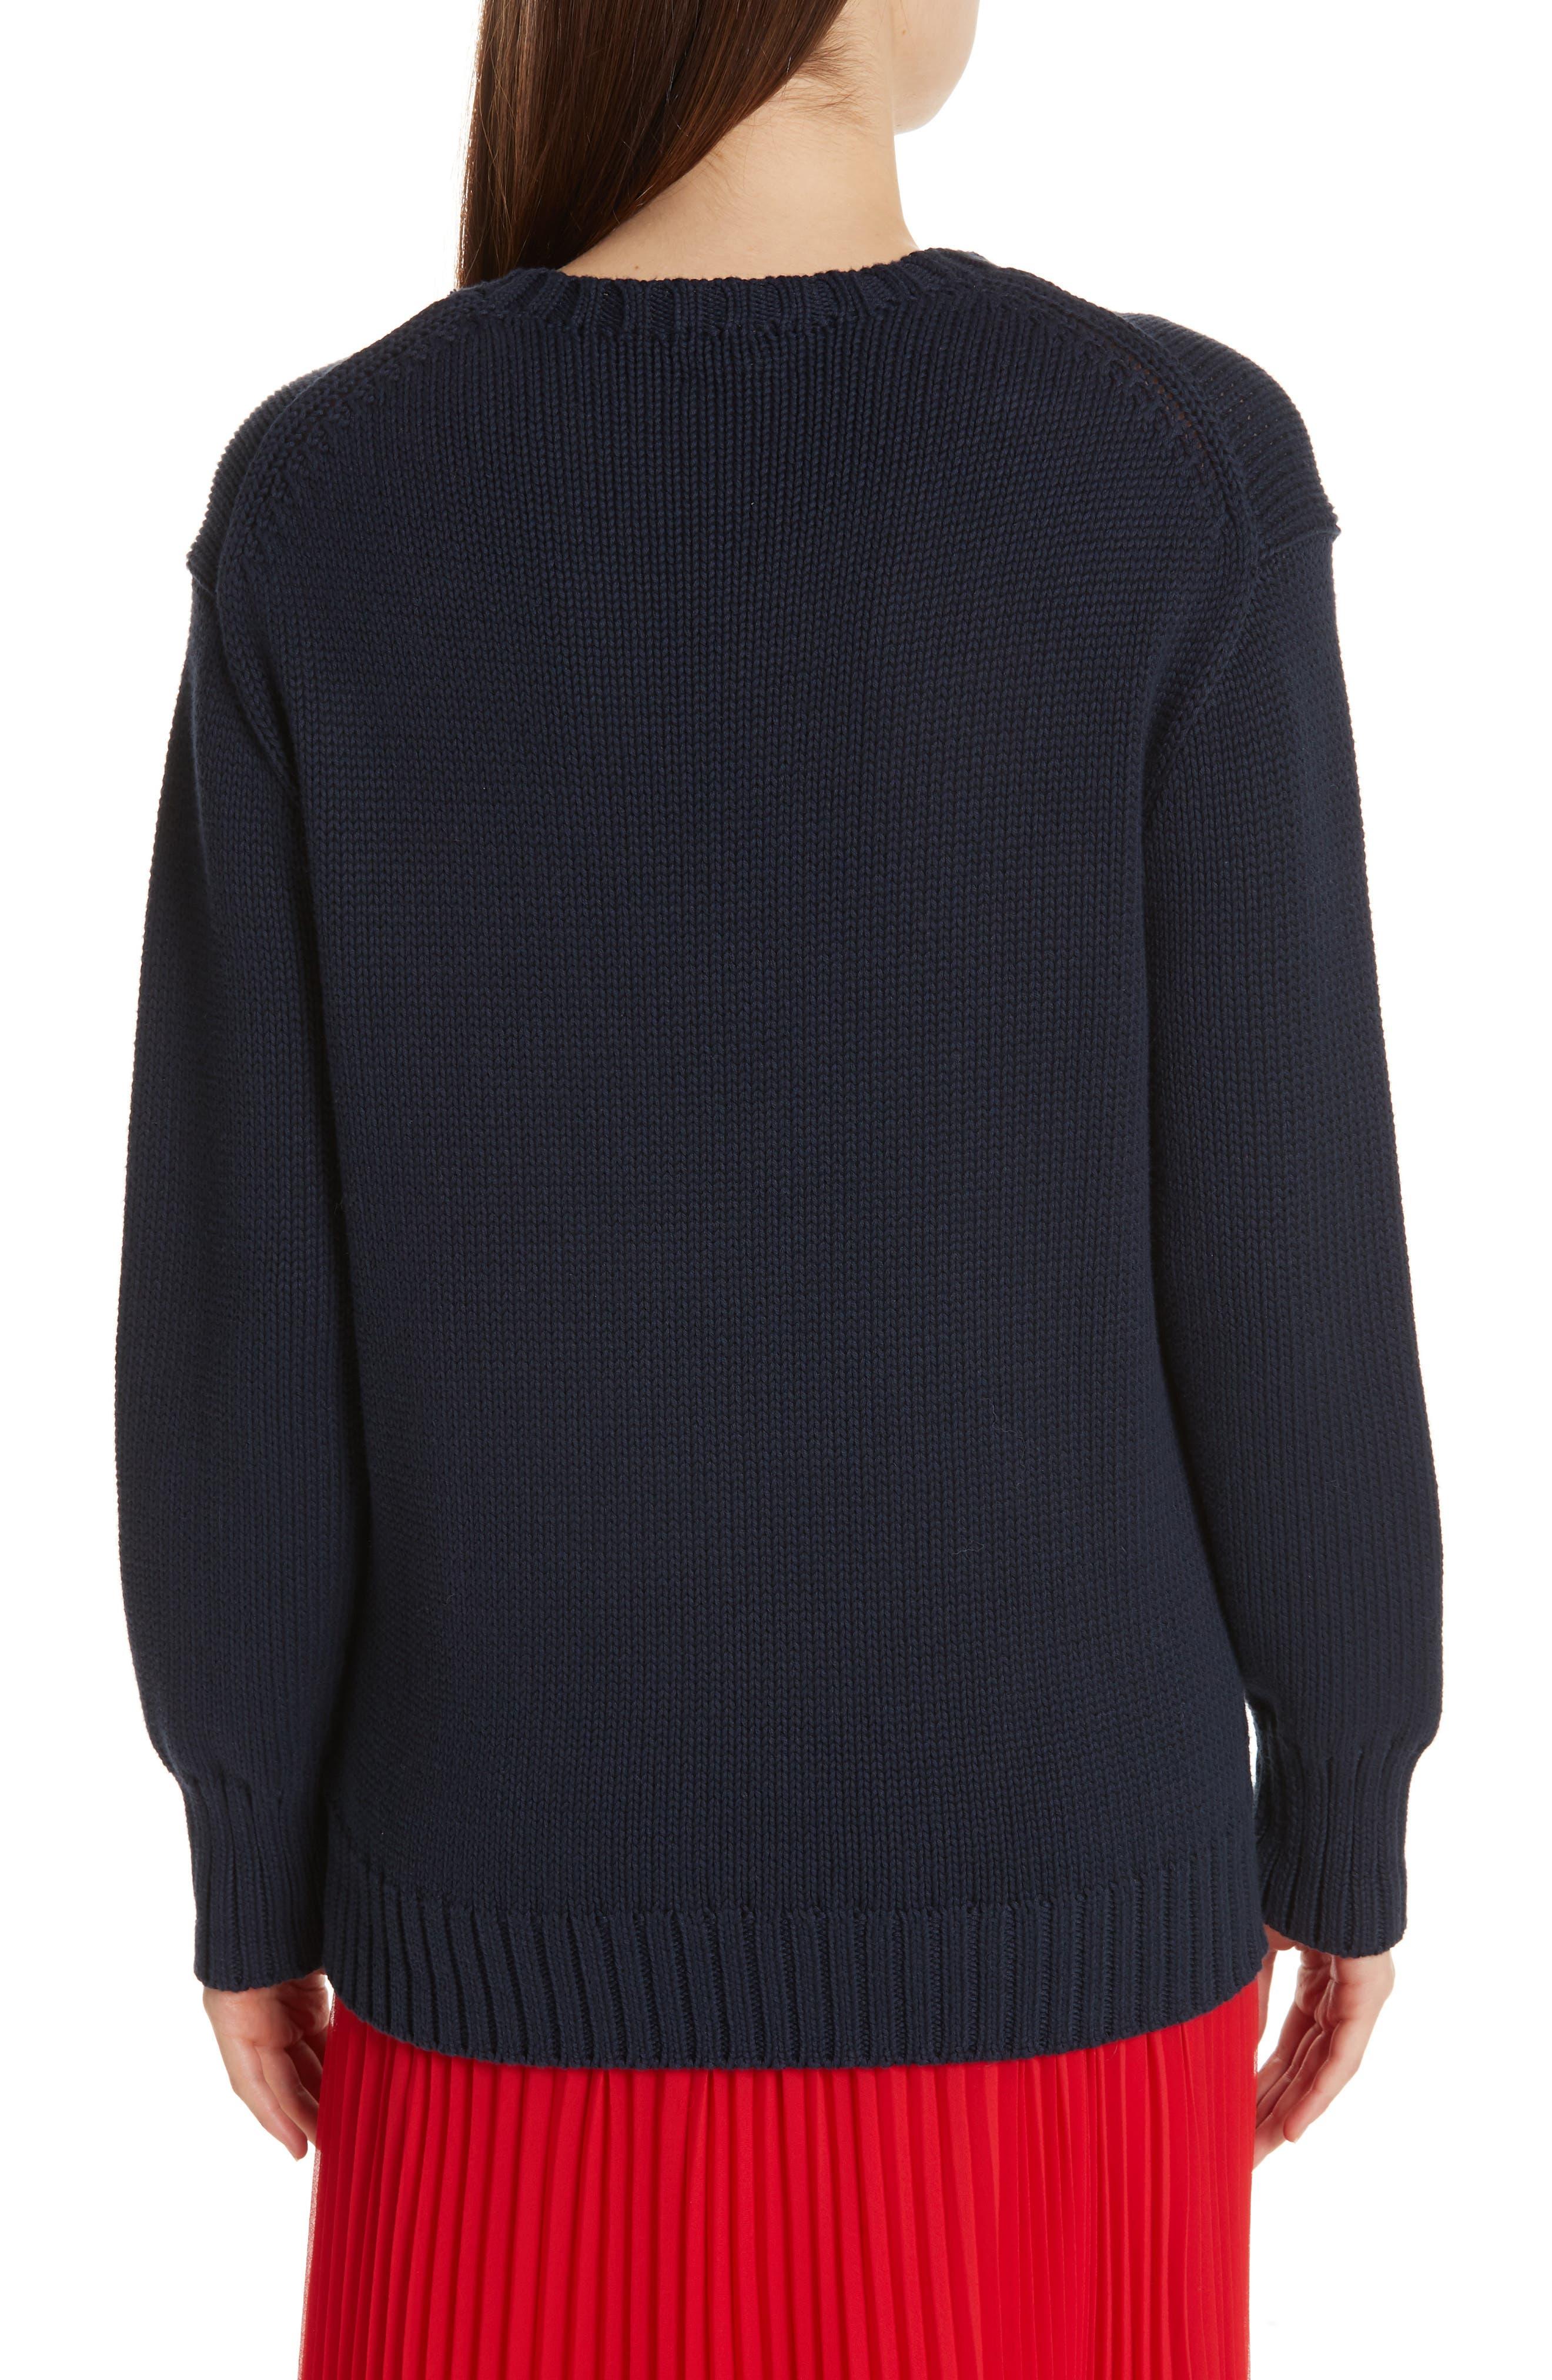 Bear Sweater,                             Alternate thumbnail 2, color,                             NAVY MULTI